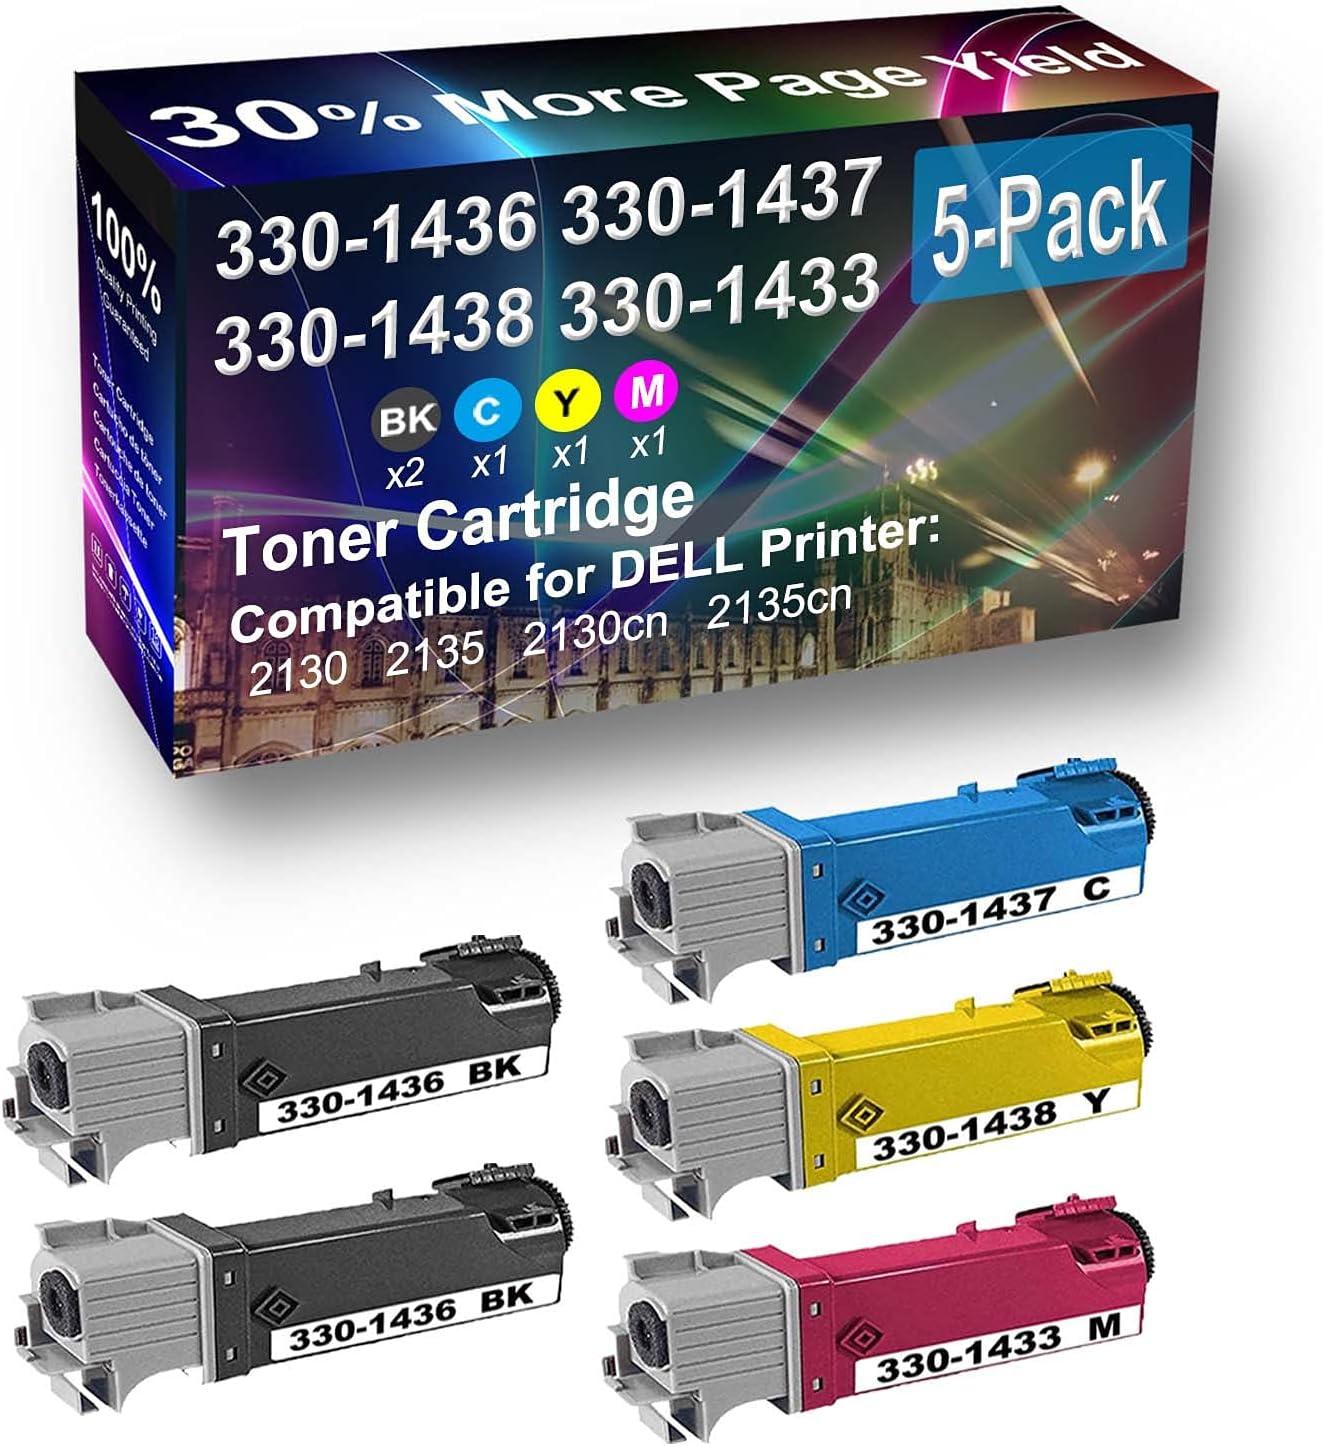 5-Pack (2BK+C+Y+M) Compatible High Yield 330-1436+ 330-1437+ 330-1438+ 330-1433 Laser Printer Toner Cartridge Used for Dell 2135cn Printer